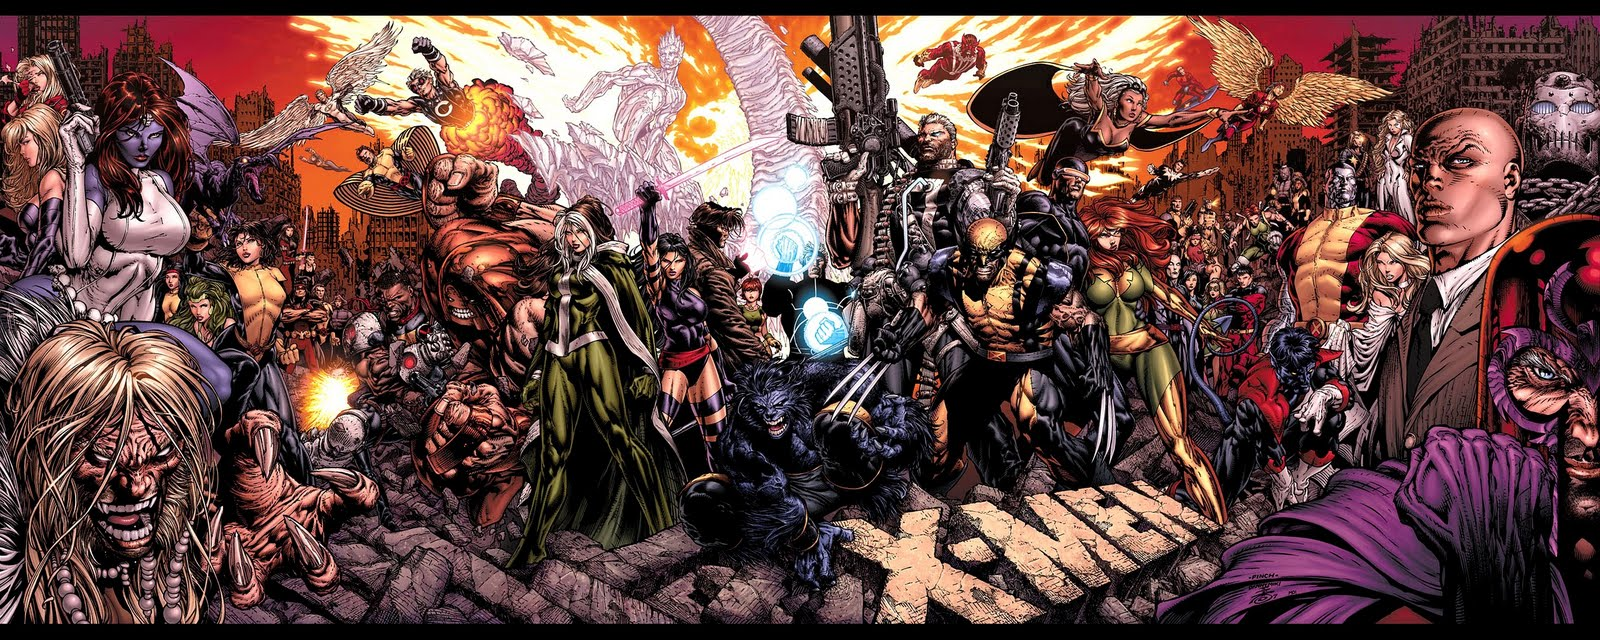 Marvel Comics HD Desktop Wallpapers Download Wallpapers in HD for 1600x640